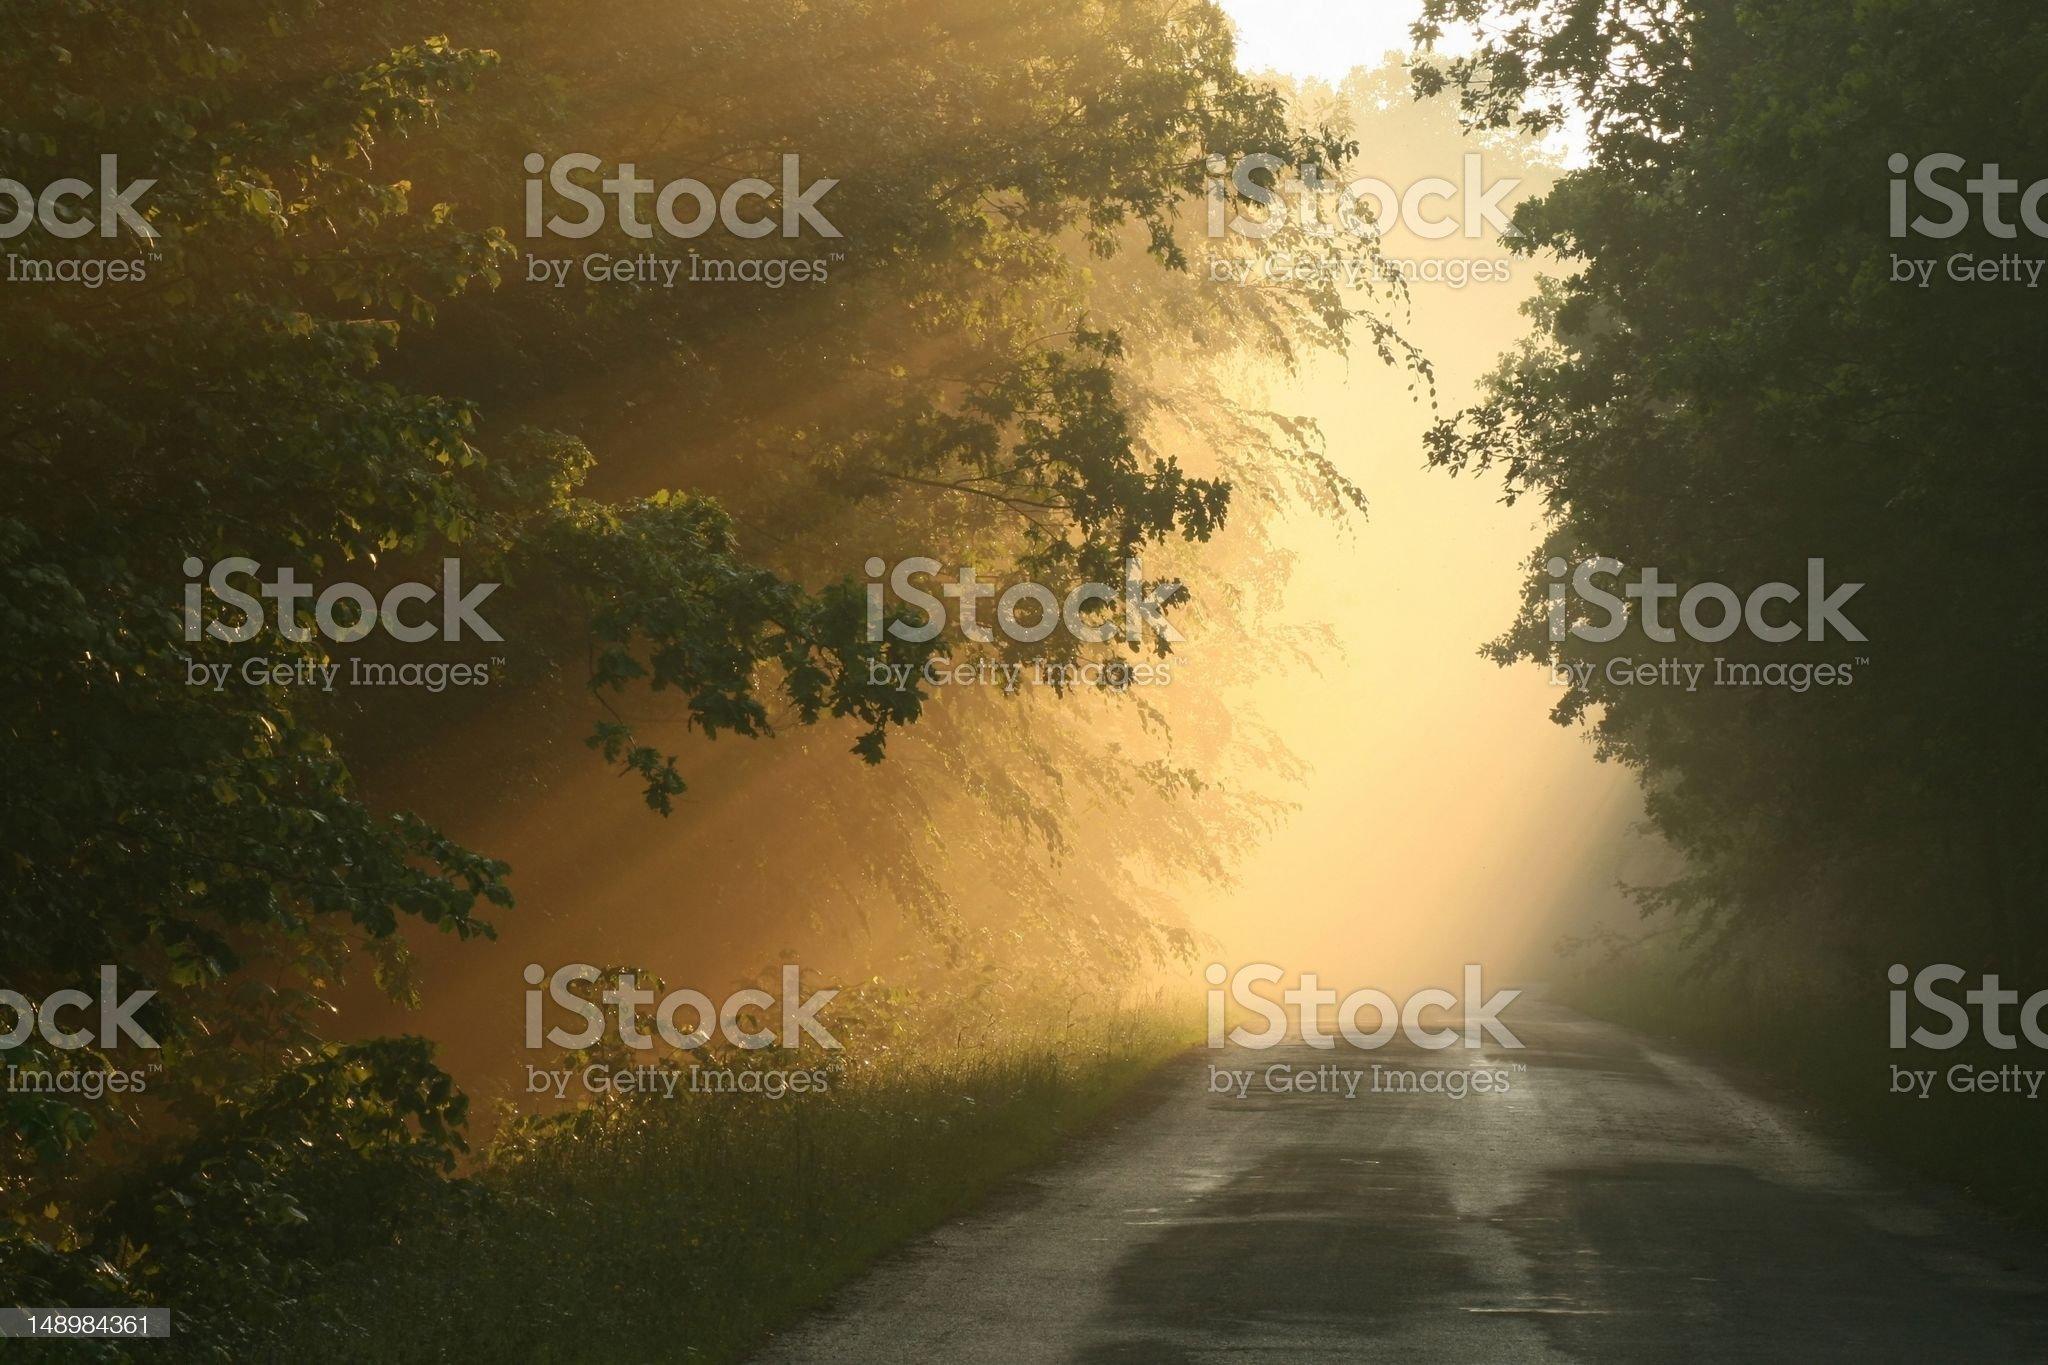 Forest lane at dusk royalty-free stock photo